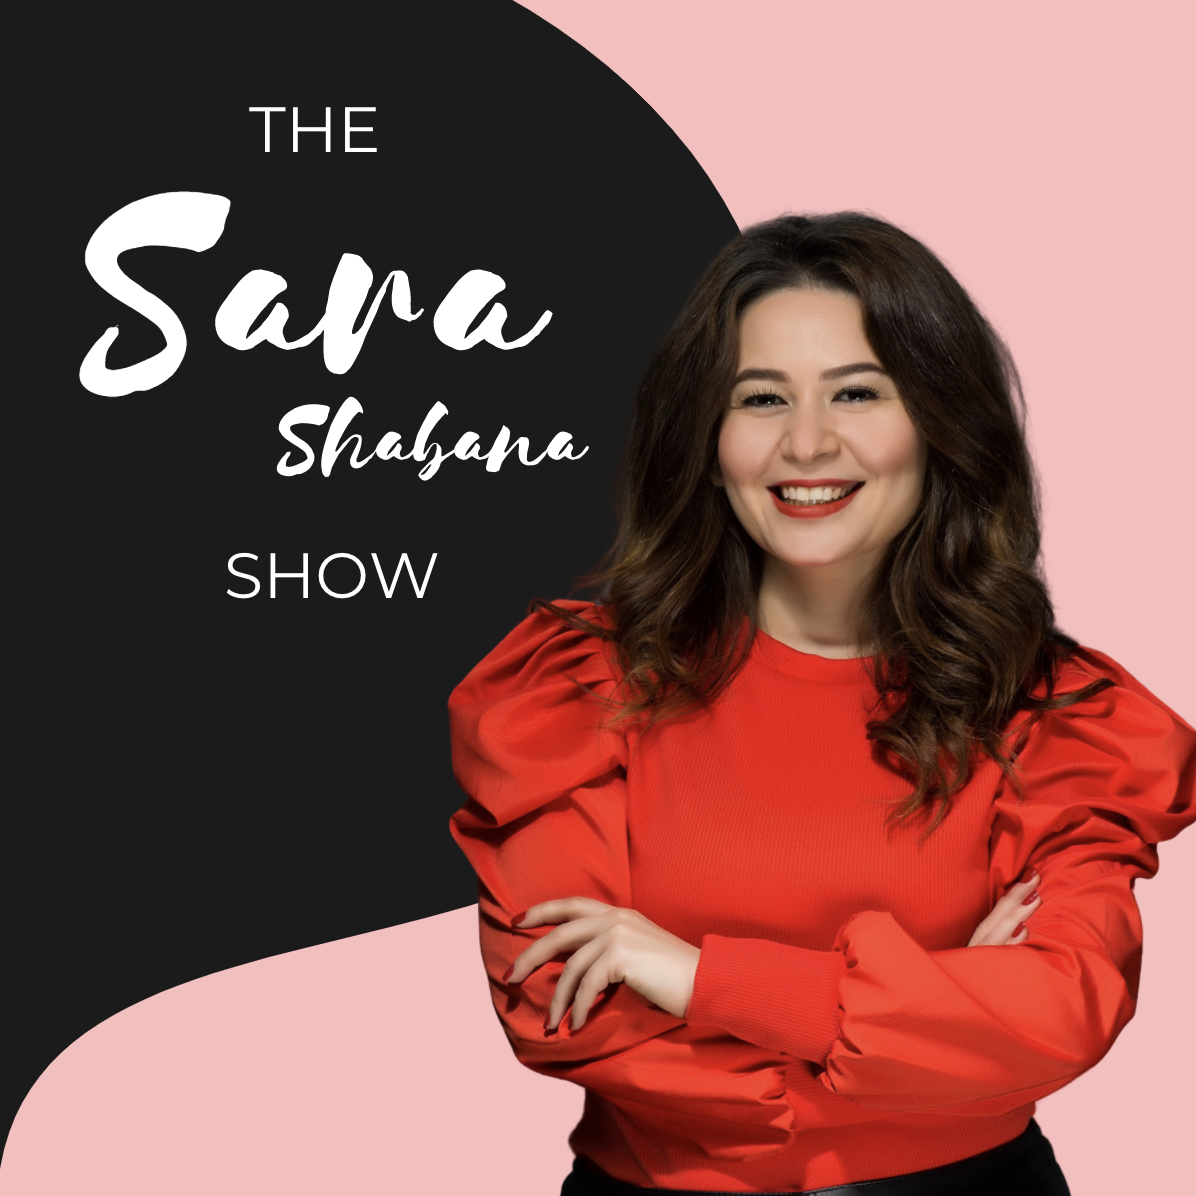 The Sara Shabana Show